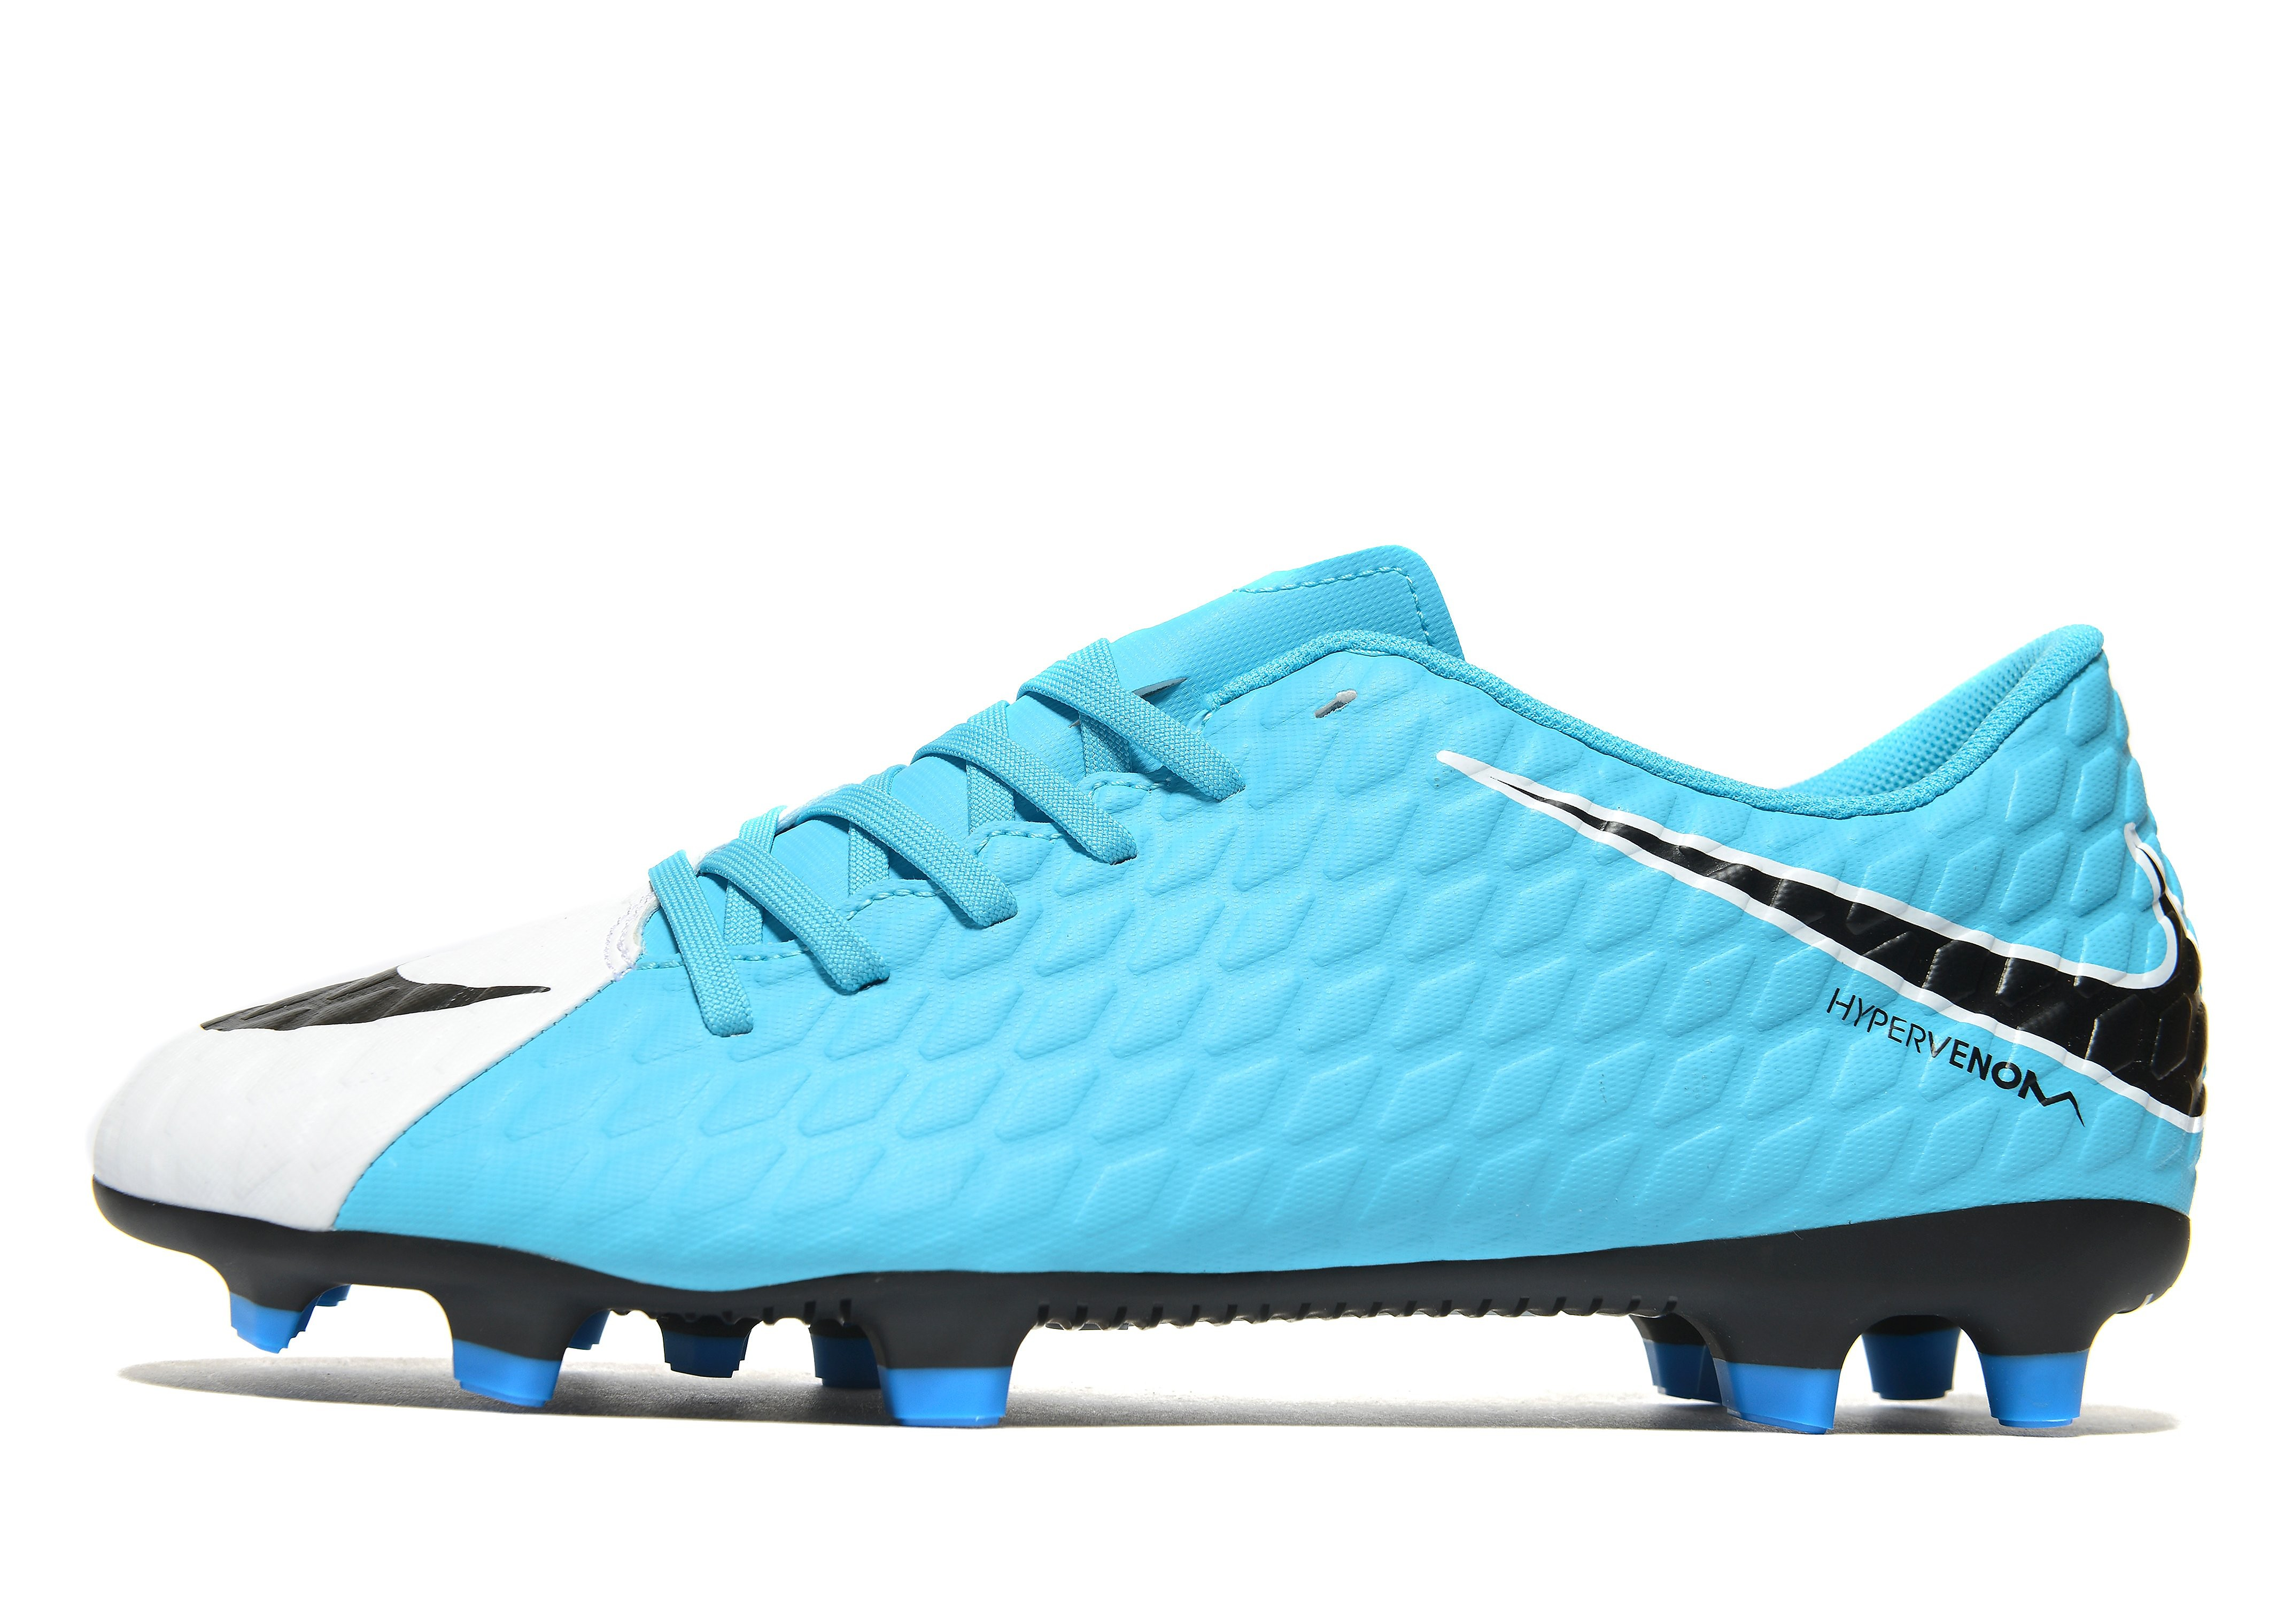 Nike Motion Blur Hypervenom Phade III FG-R